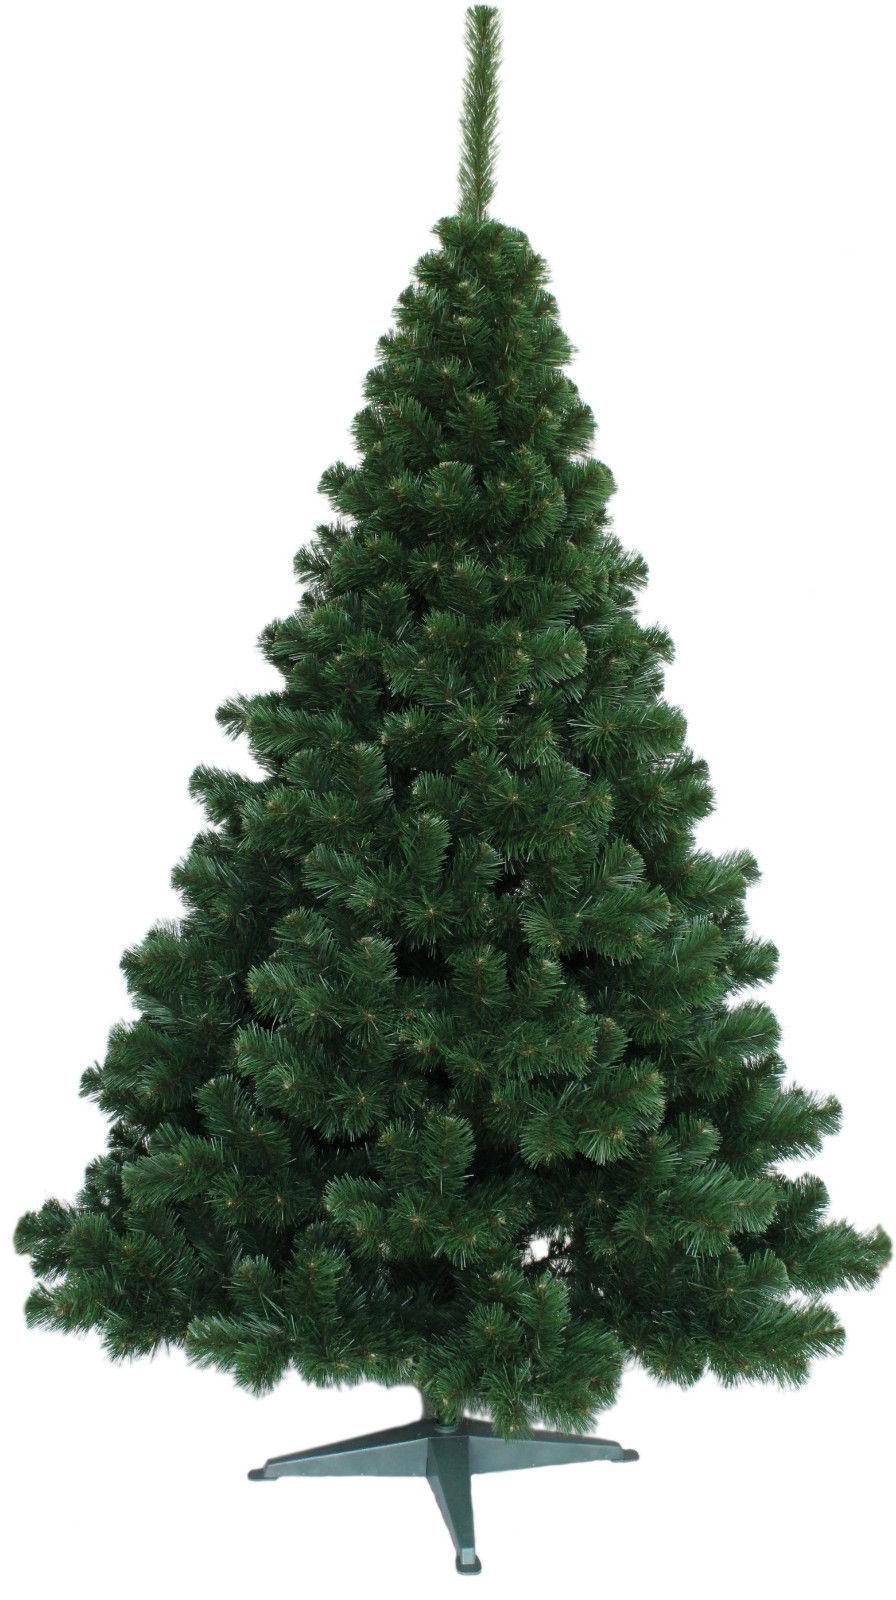 Luxury Christmas Tree New Boxed Traditional Forest Grün Pine Bushy 3 Größes Fir